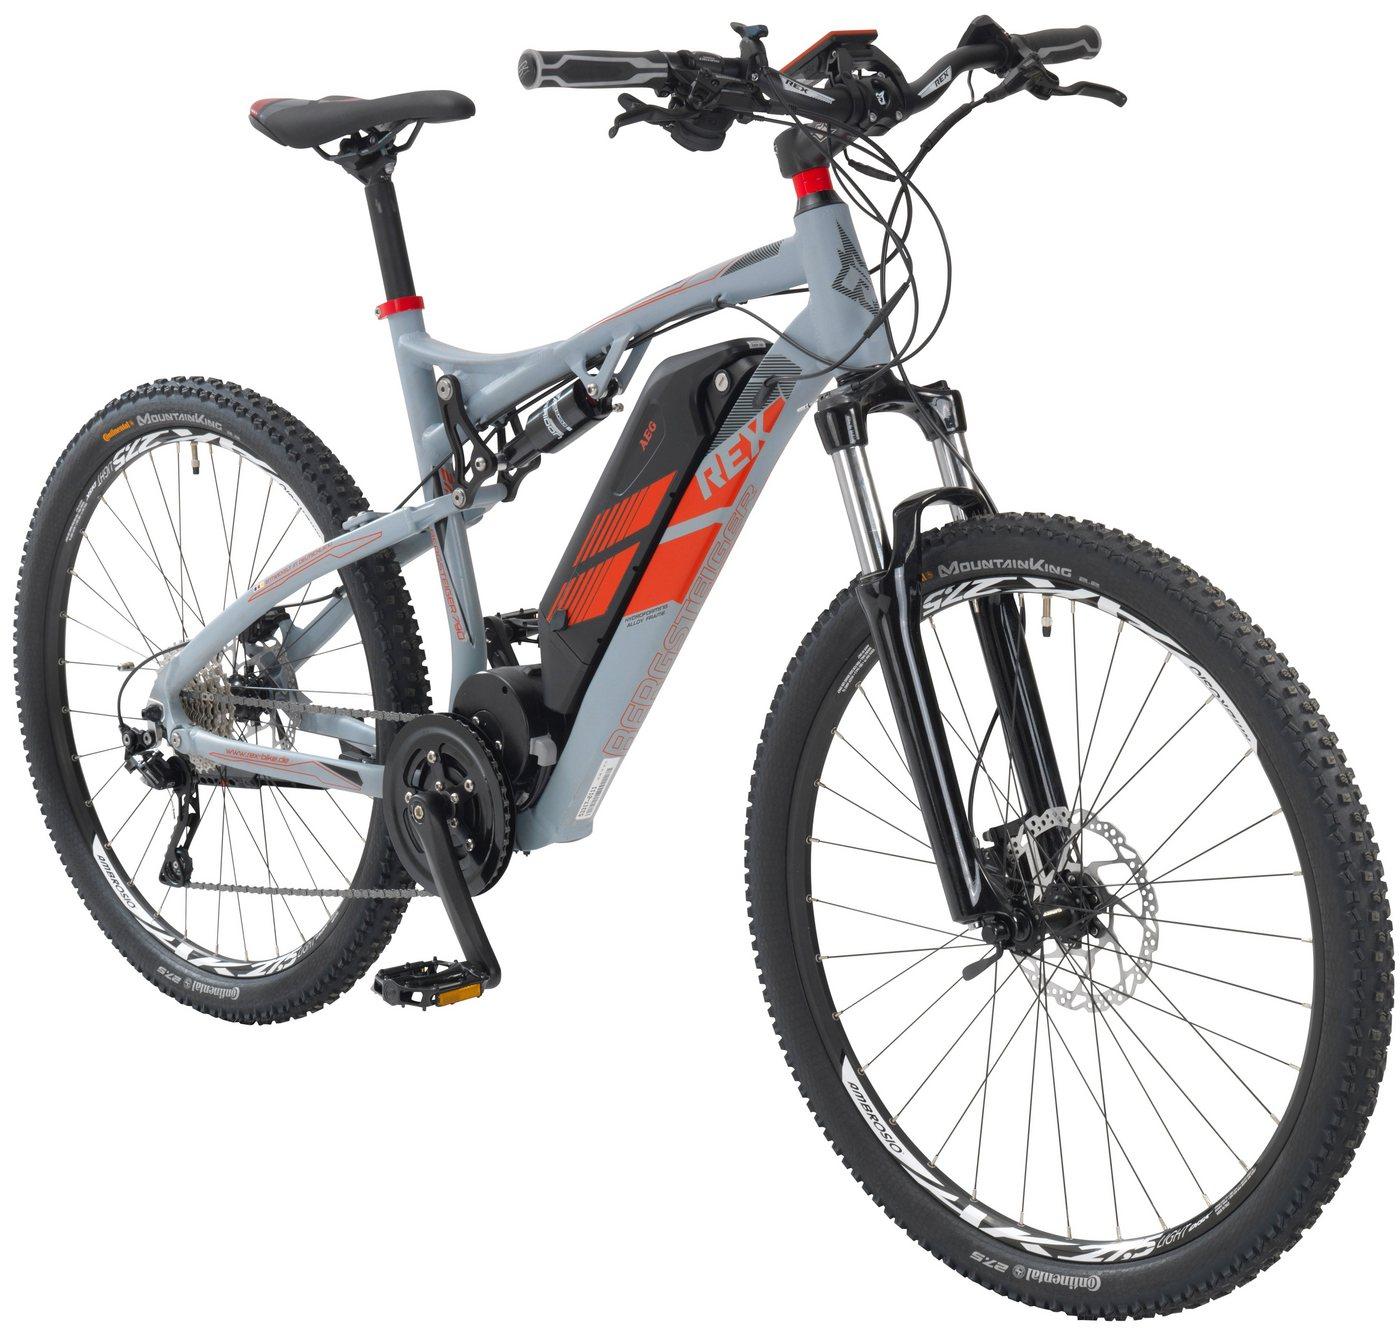 Schipkau Angebote REX E-Bike Mountainbike »Bergsteiger 790«, 27,5 Zoll, 10 Gang, Mittelmotor, 500 Wh